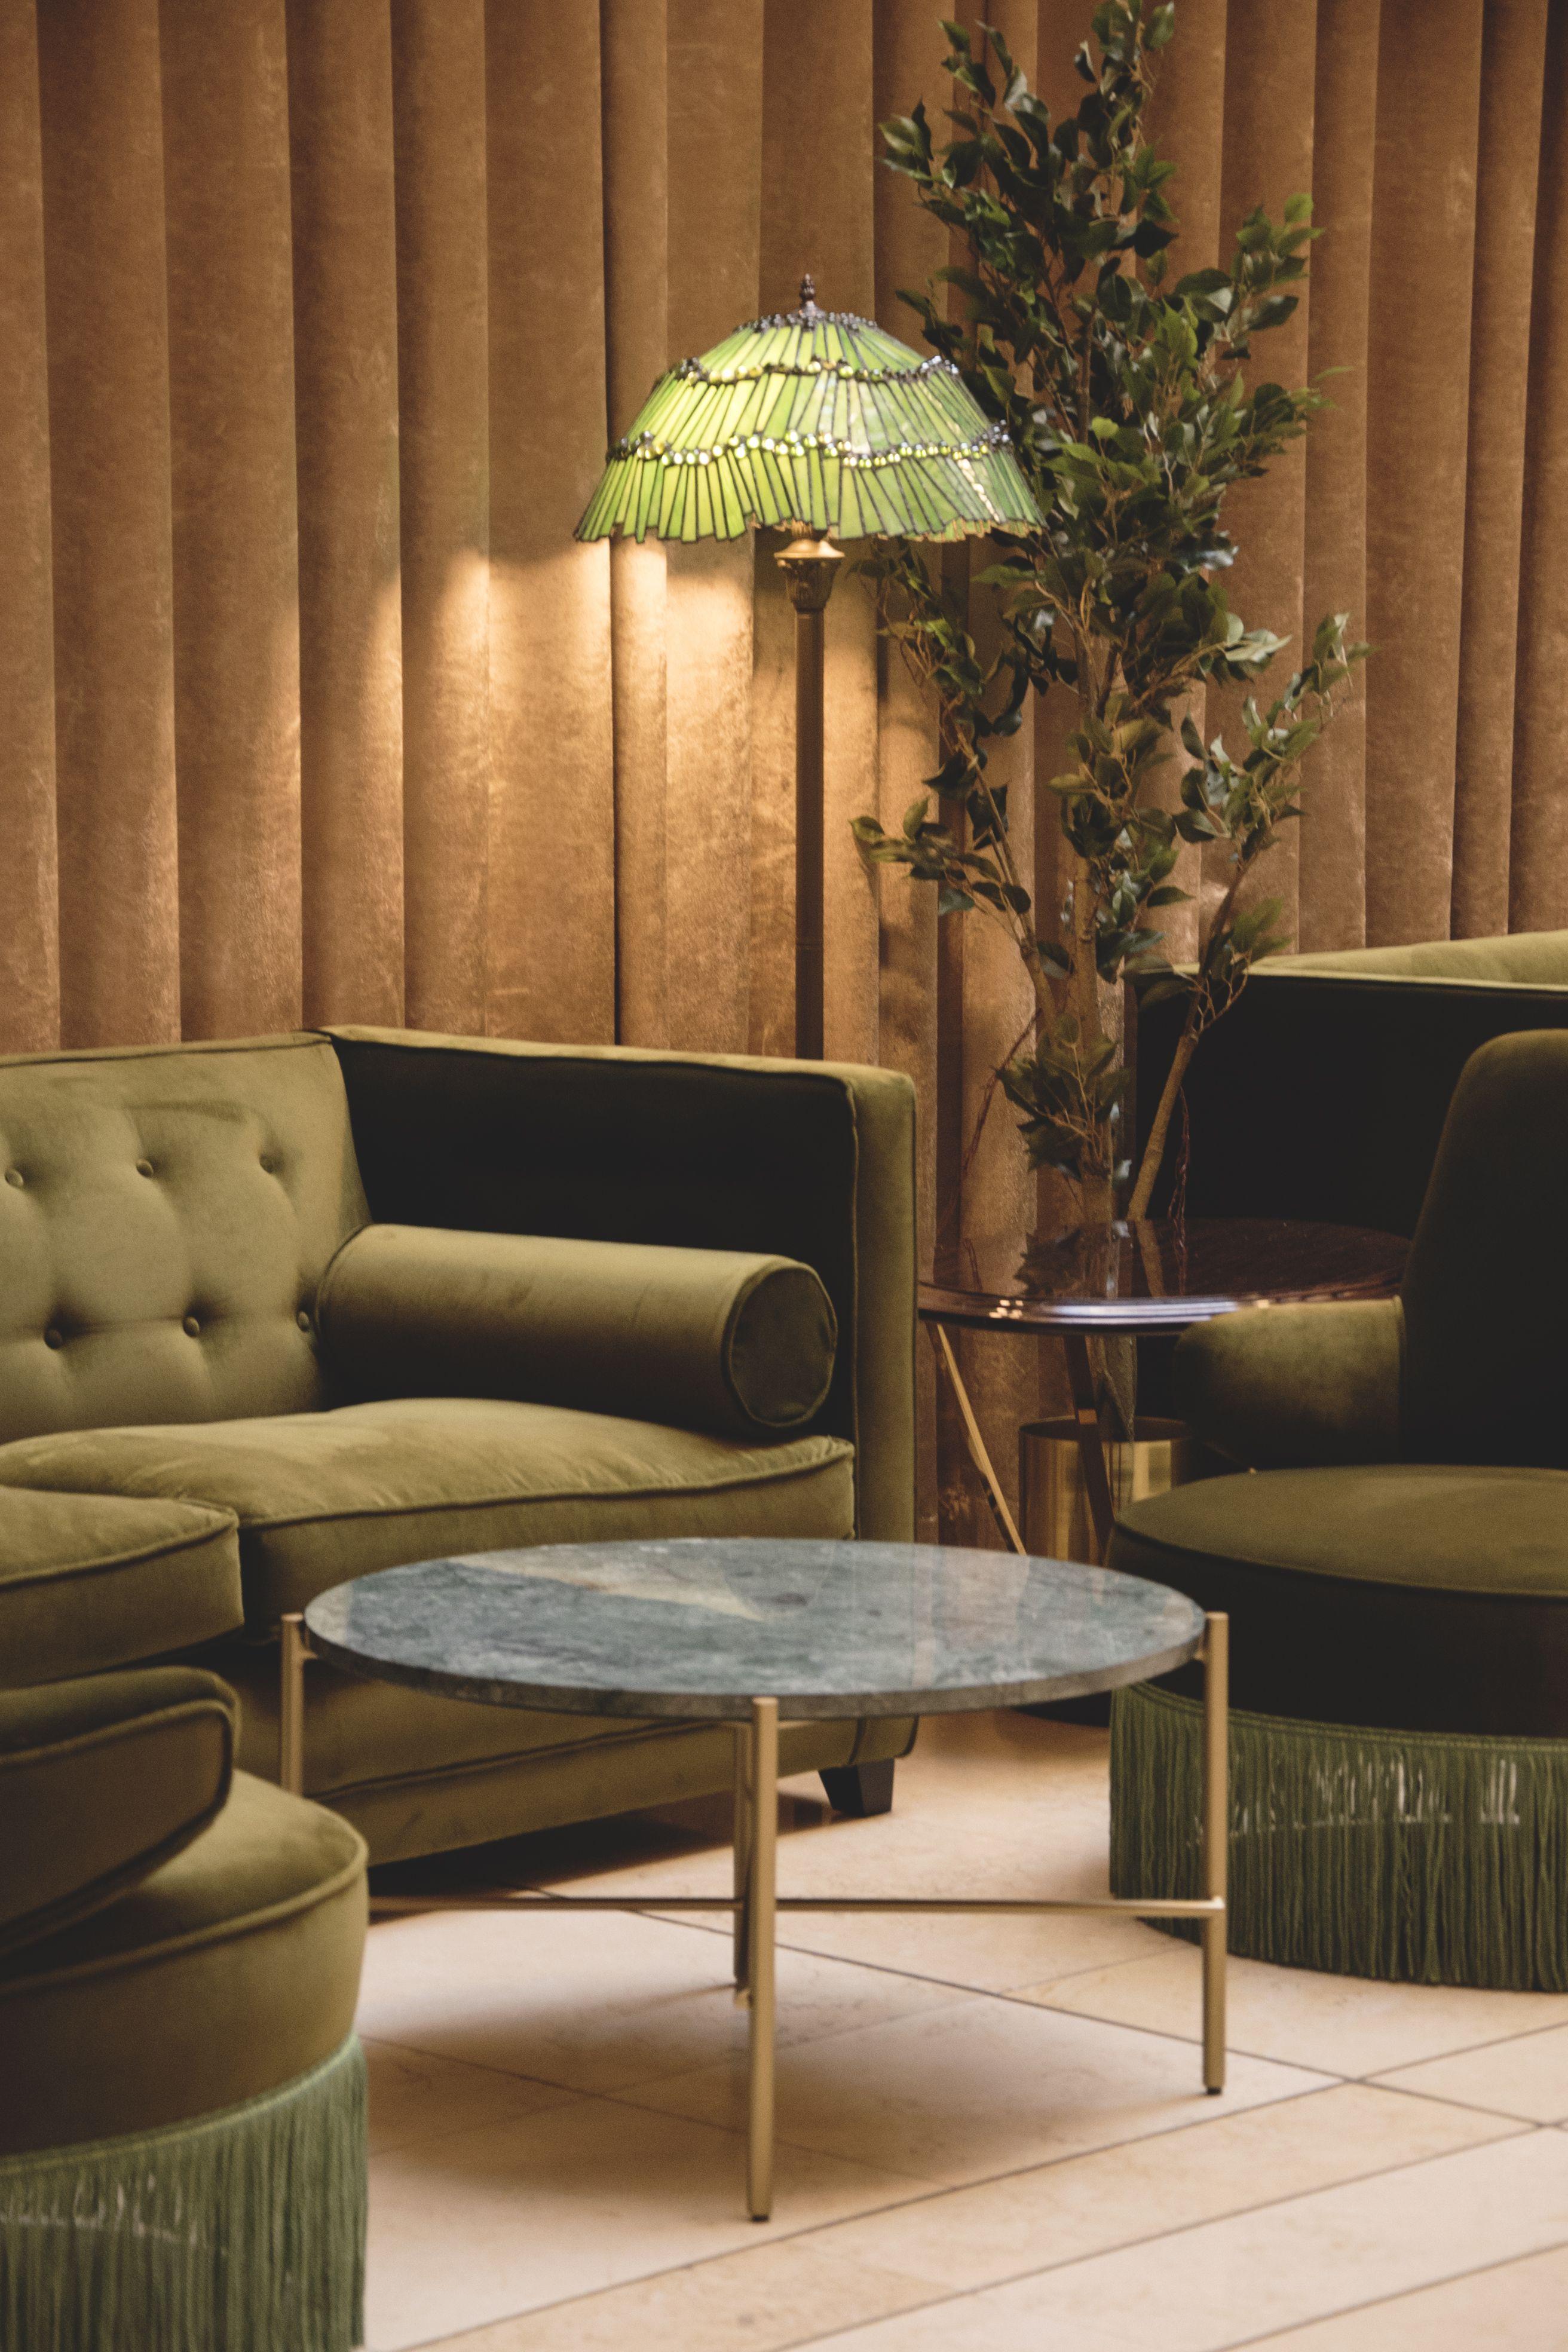 I Designed The Jin Bar For The Dorsett Hotel In Spring 2019 The